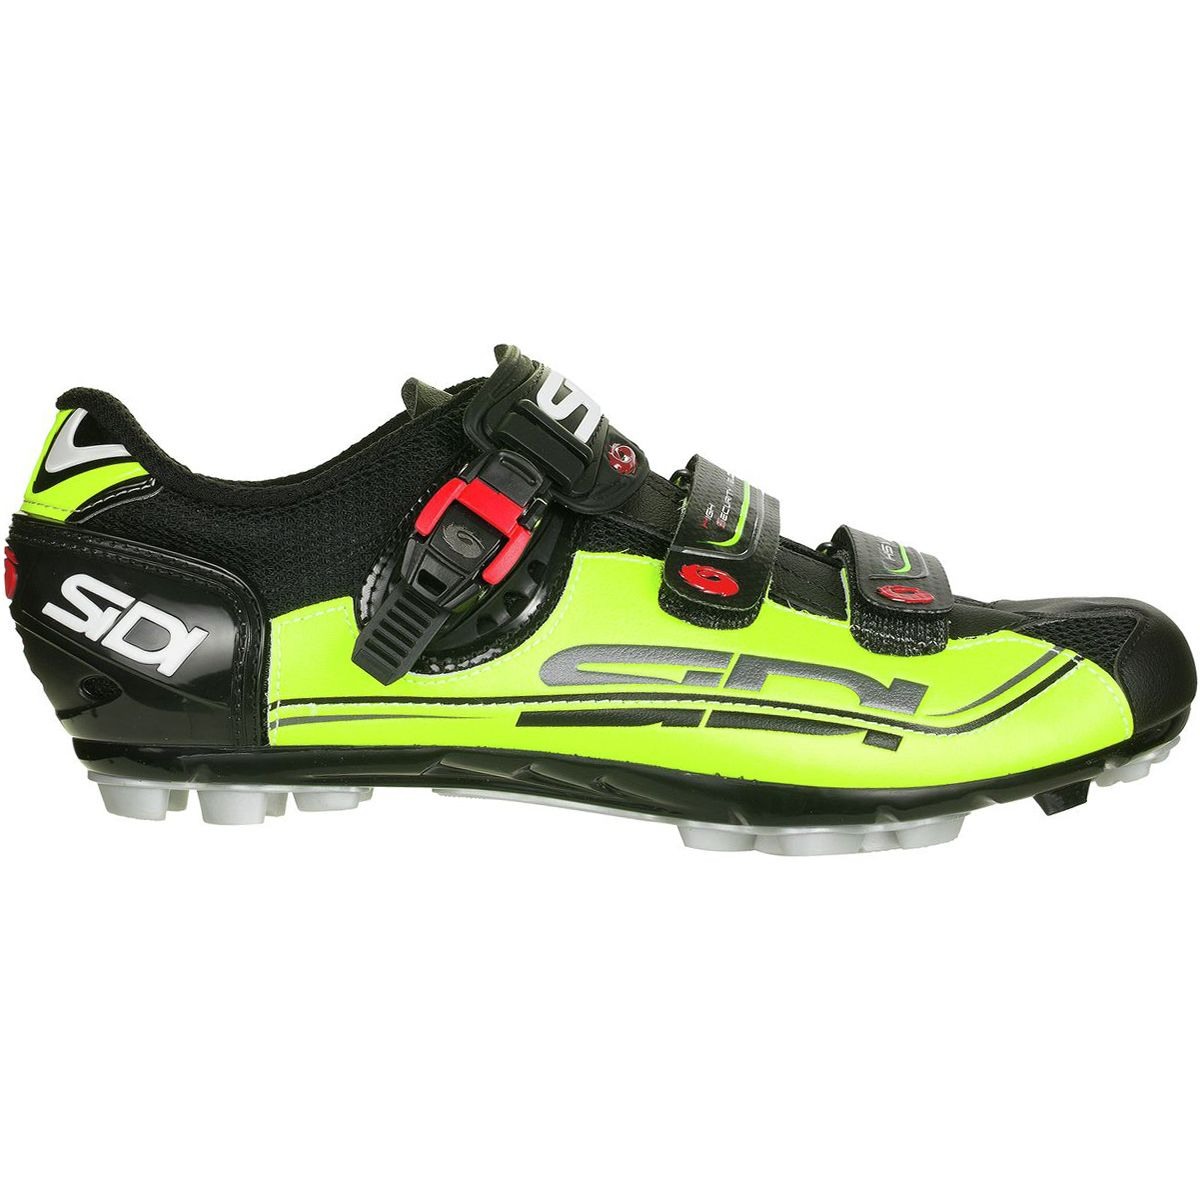 Sidi Dominator 7 Shoe - Men's